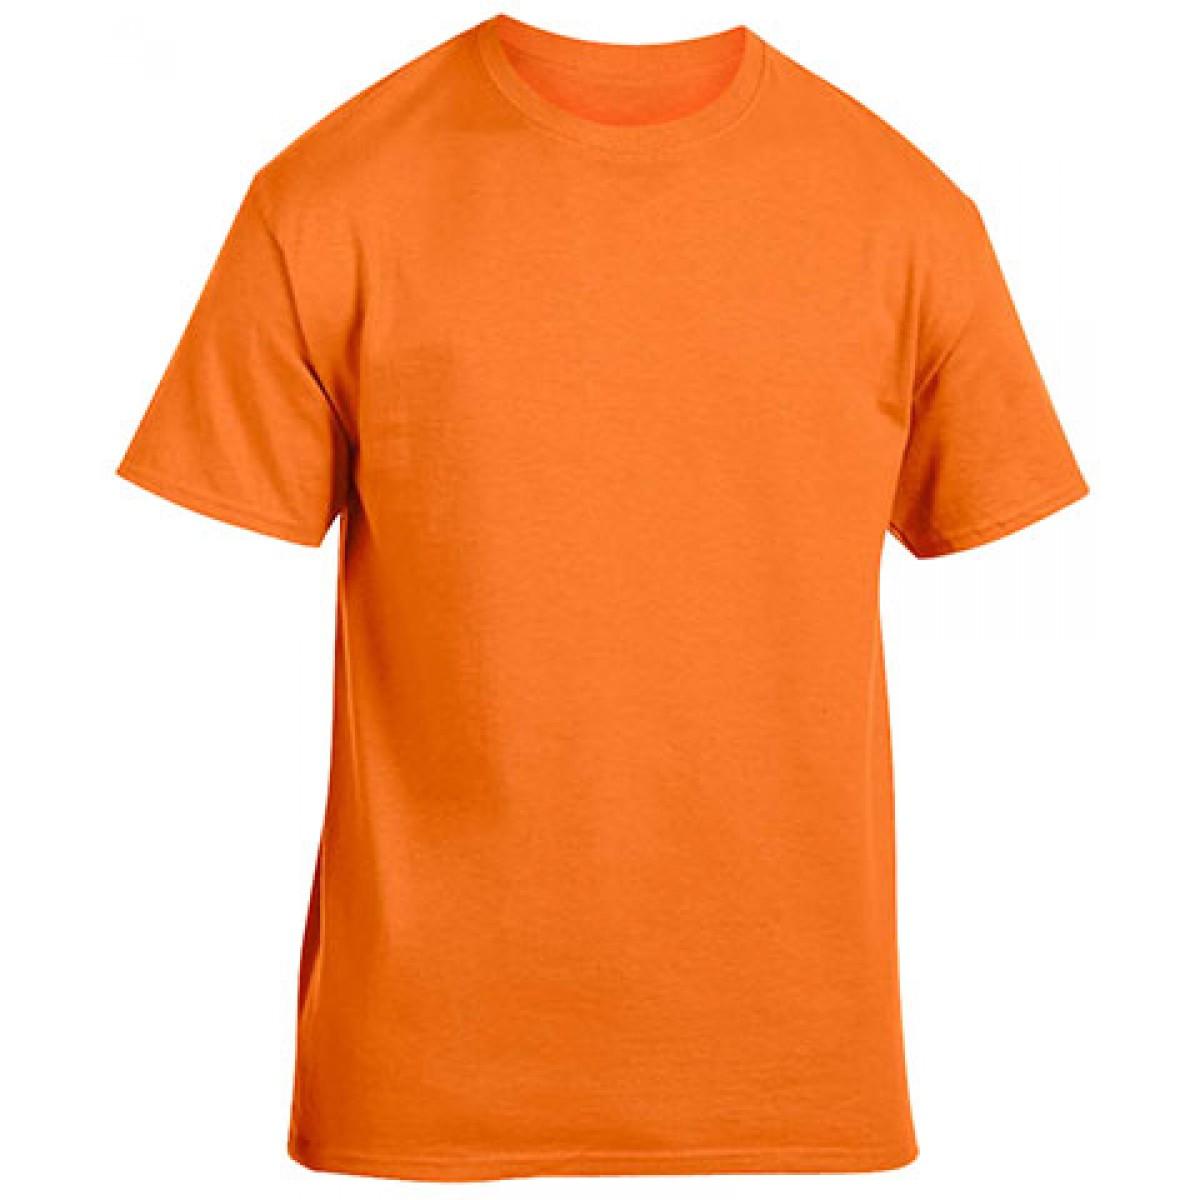 Cotton Short Sleeve T-Shirt-Safety Orange-XS